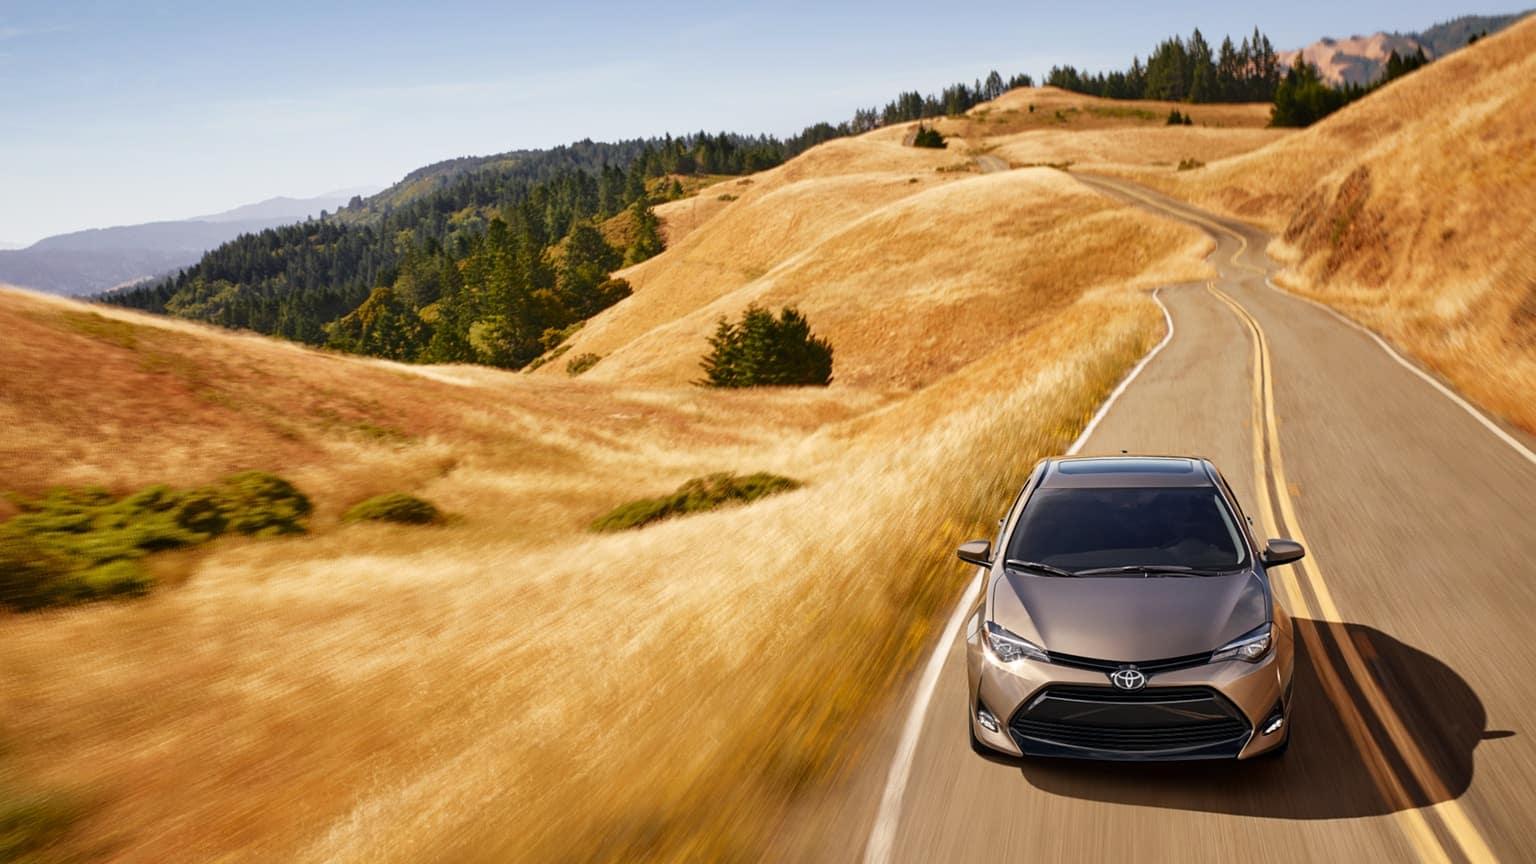 2019 Toyota Corolla driving on road